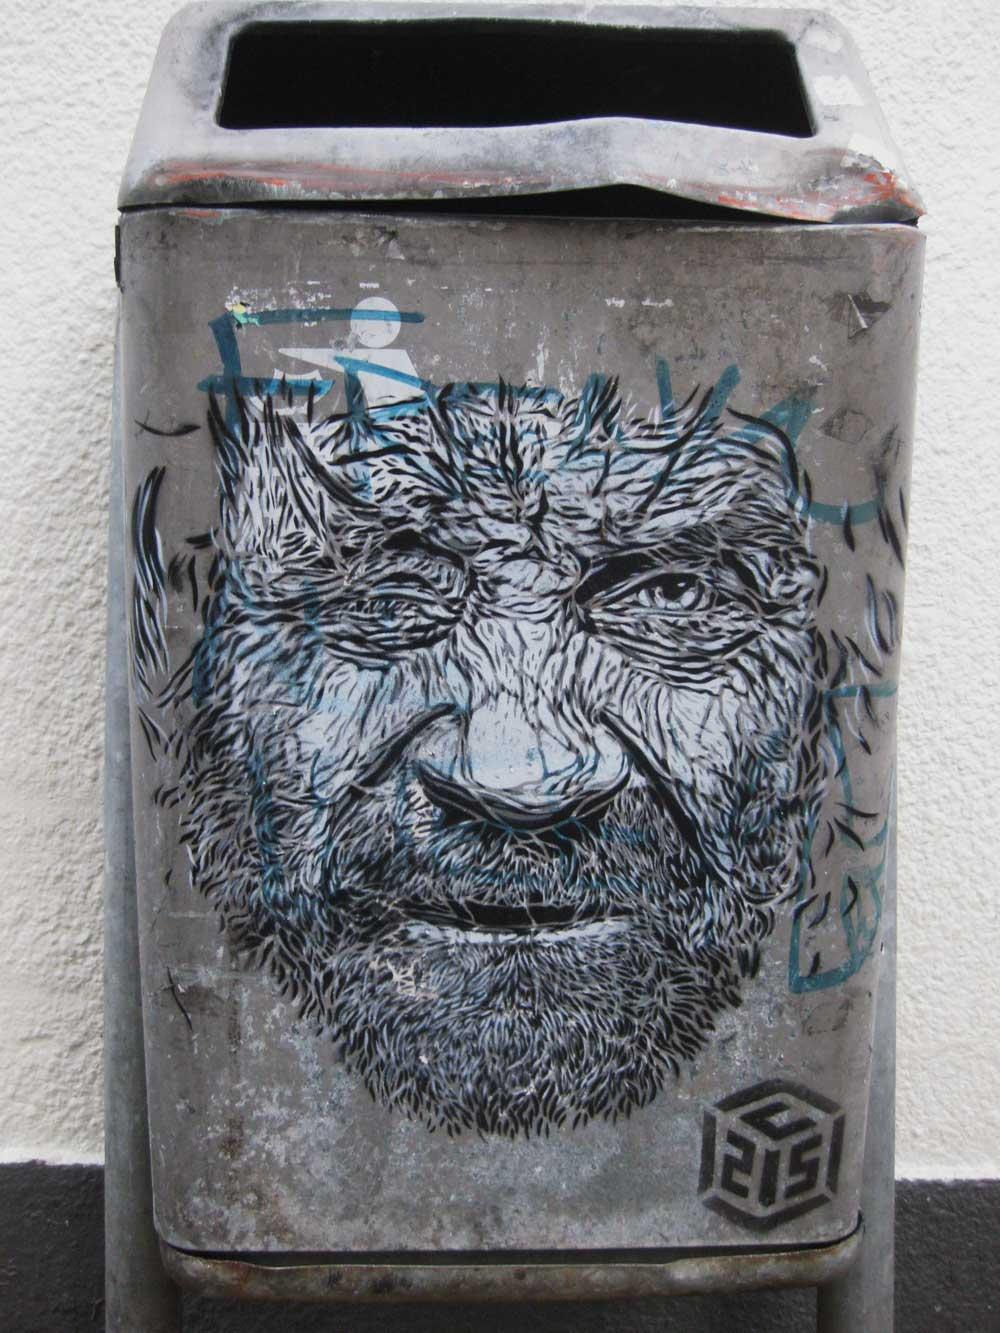 Artwork By C215 in Maastricht